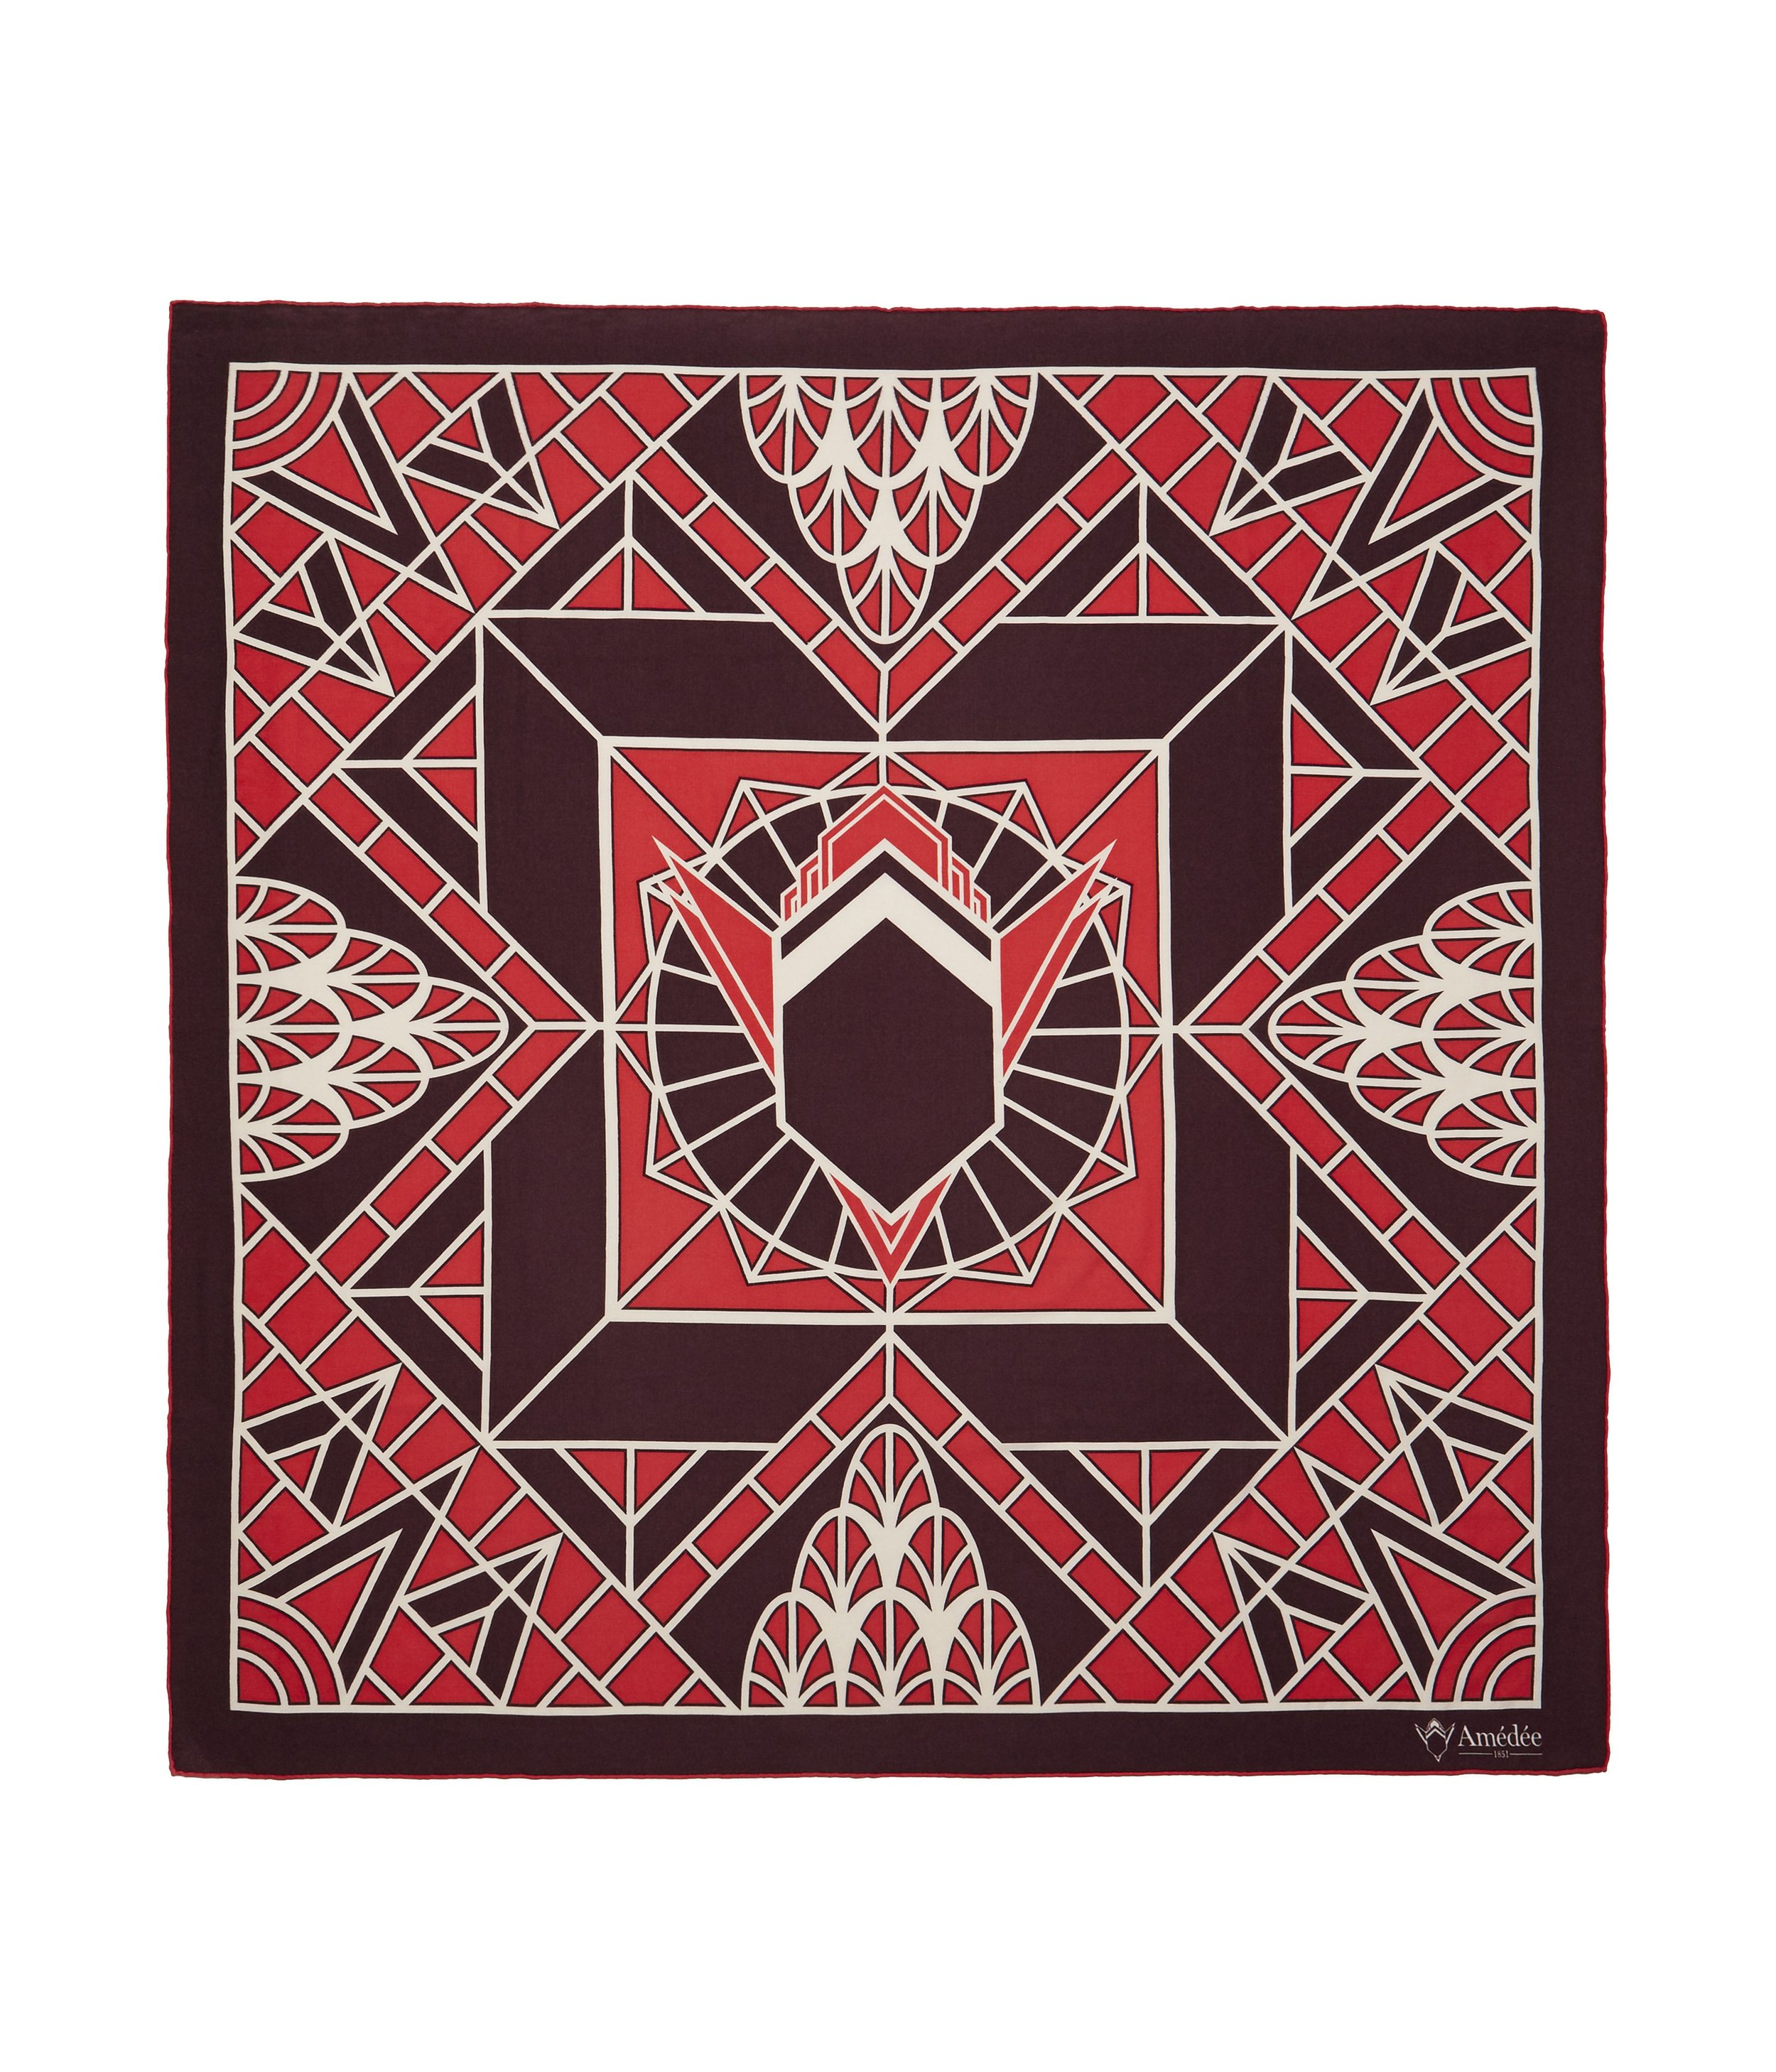 Amedee Paris scarf